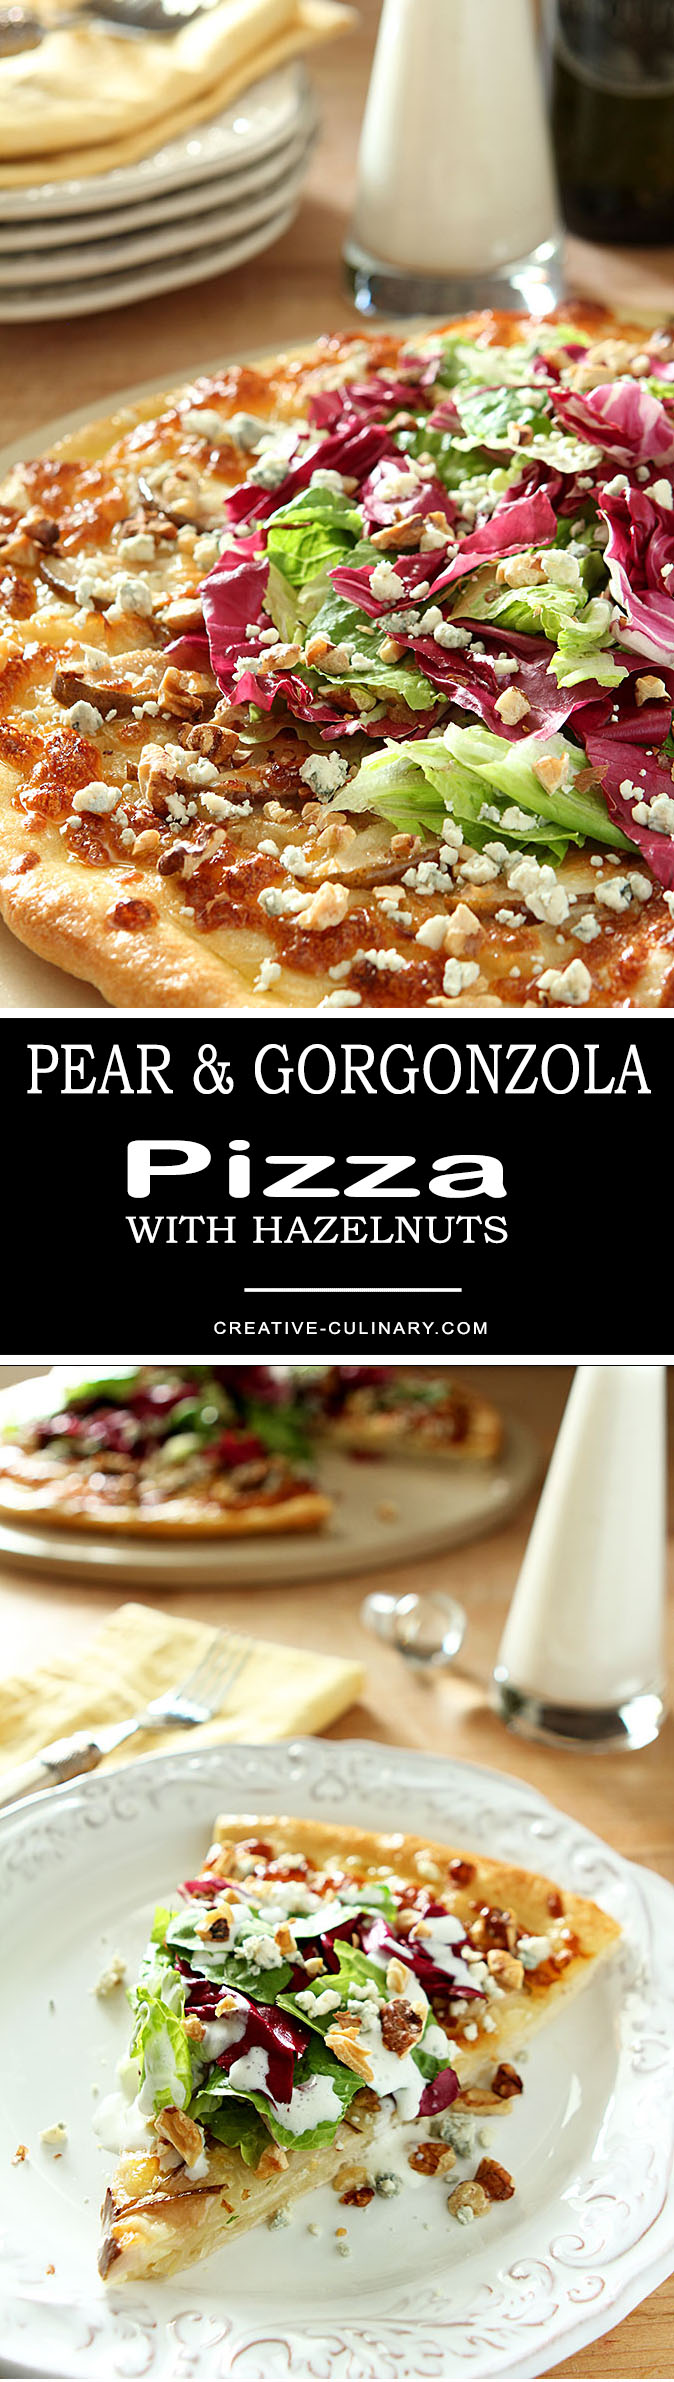 California Pizza Kitchen Pear And Gorgonzola Salad Recipe